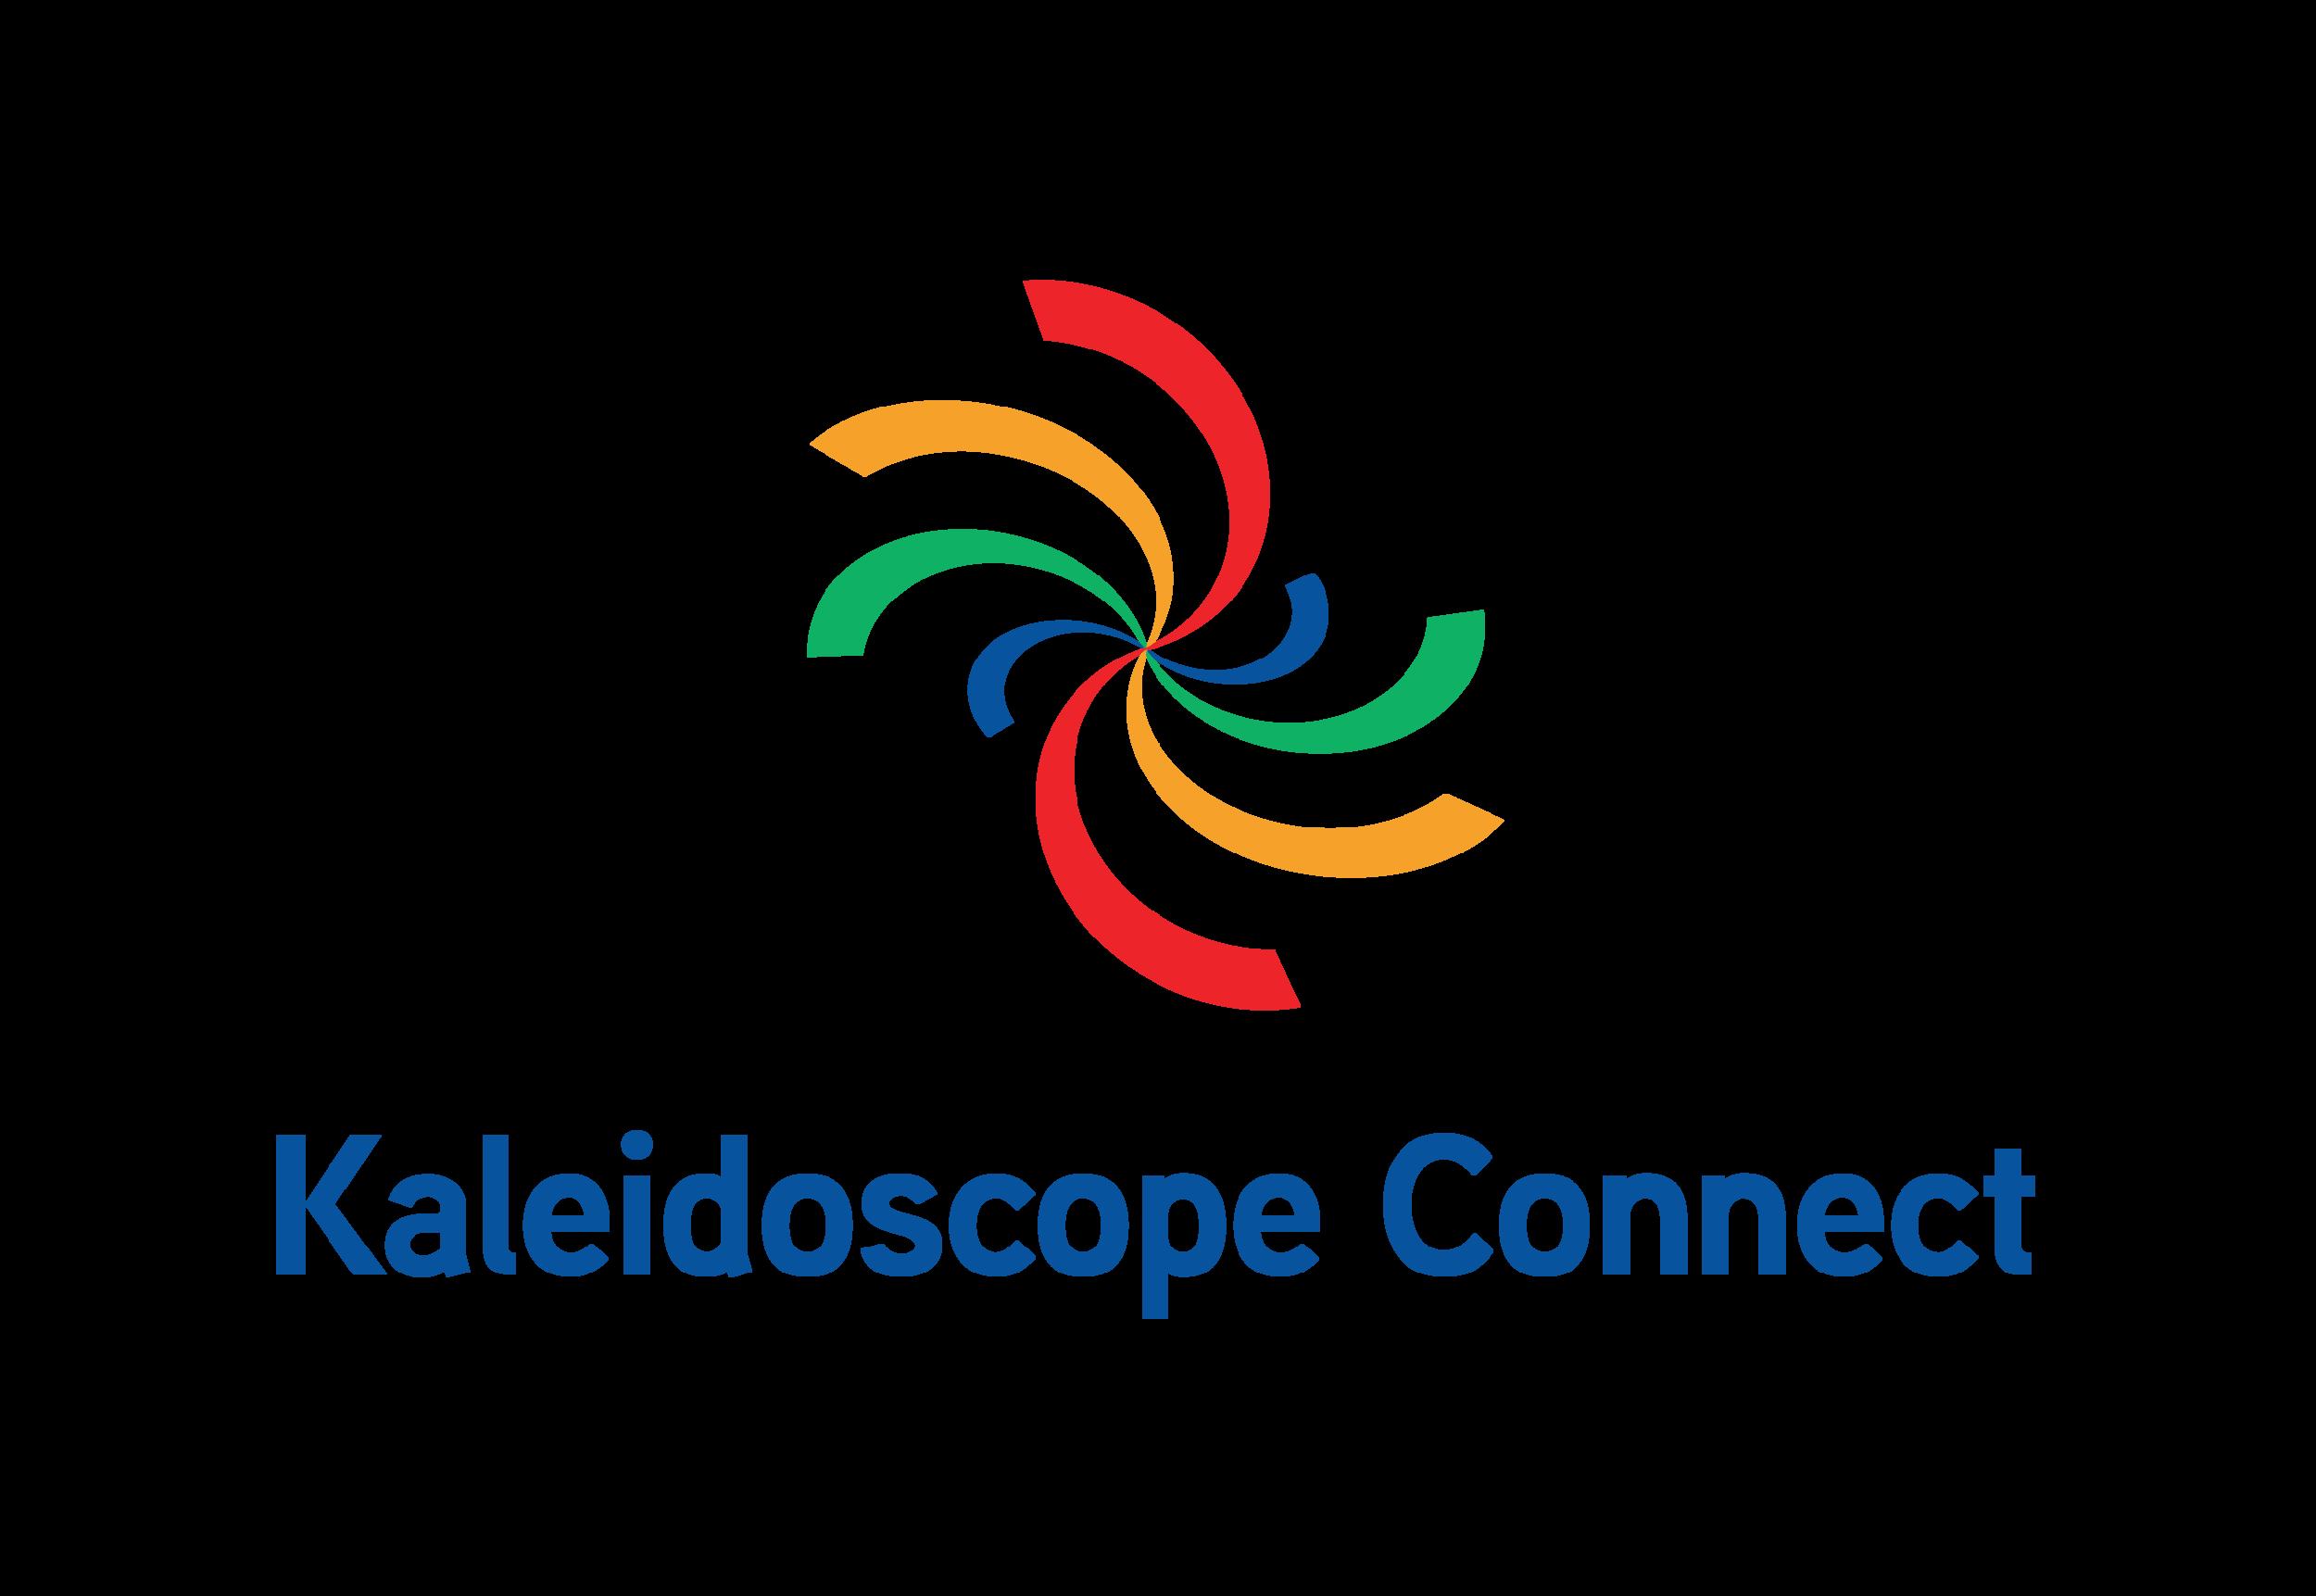 KS_FullColor_RGB_600dpi.png